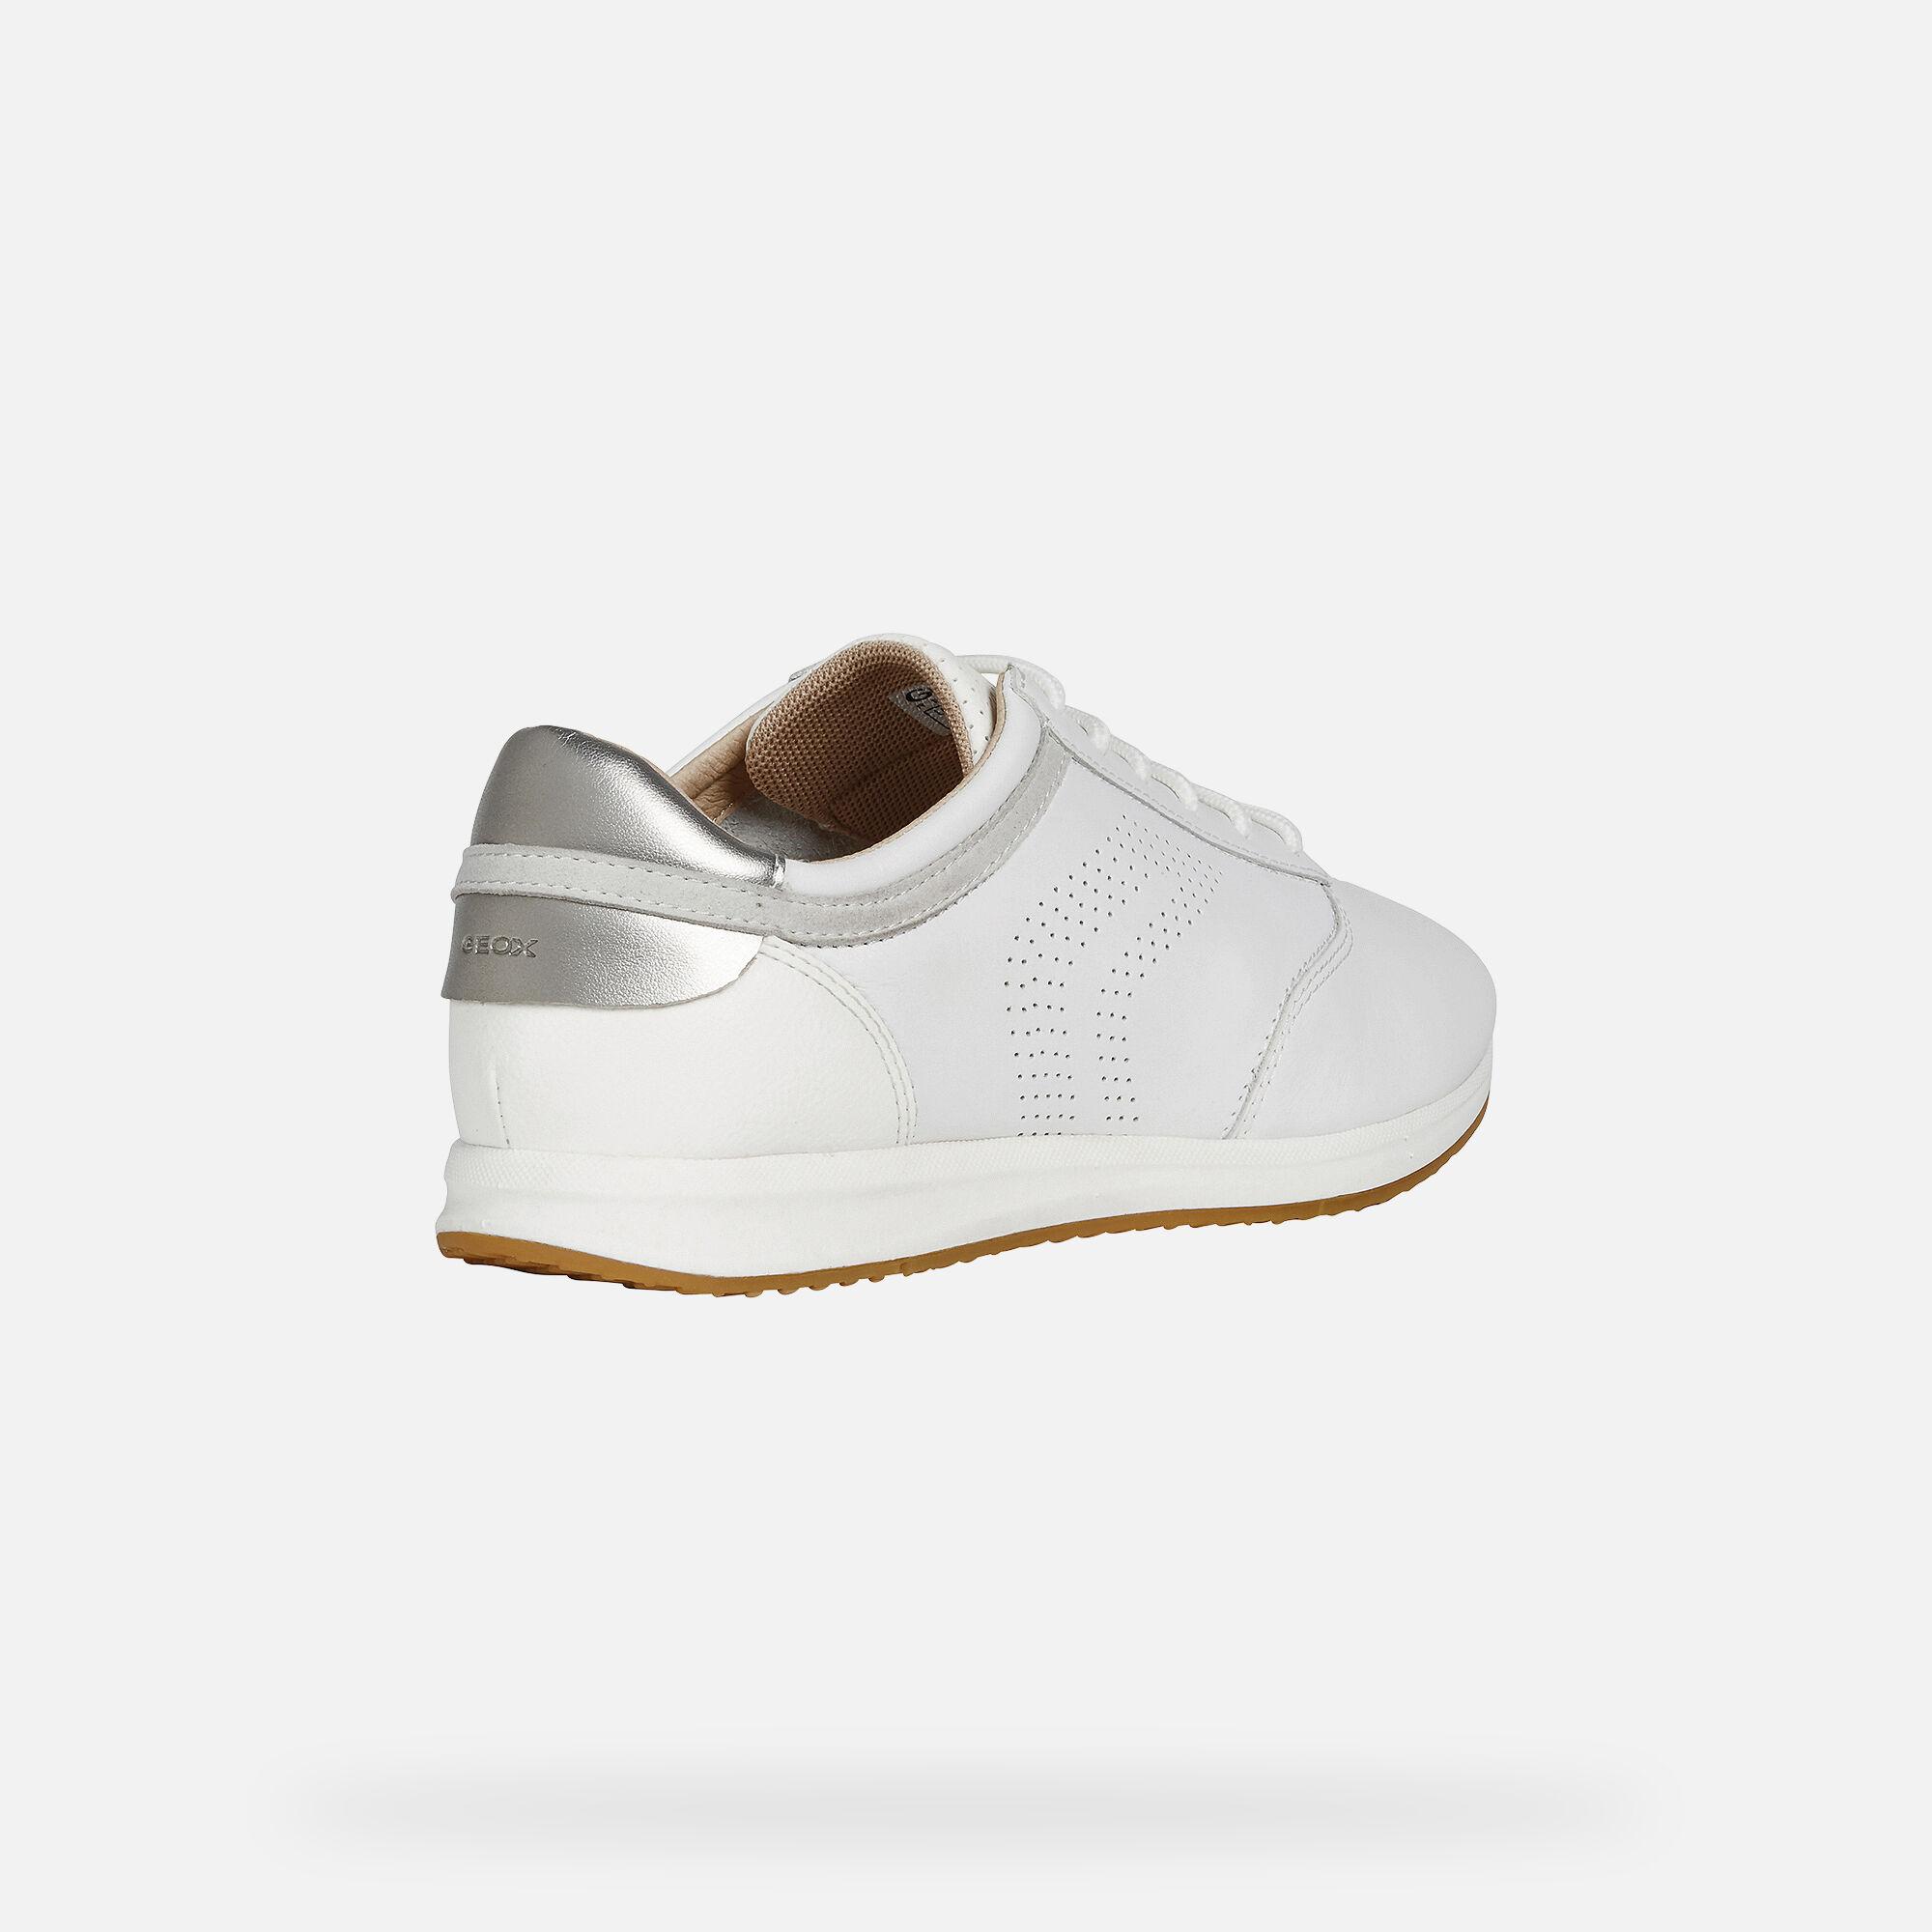 geox shoes sale online, Geox u avery men's sports shoes